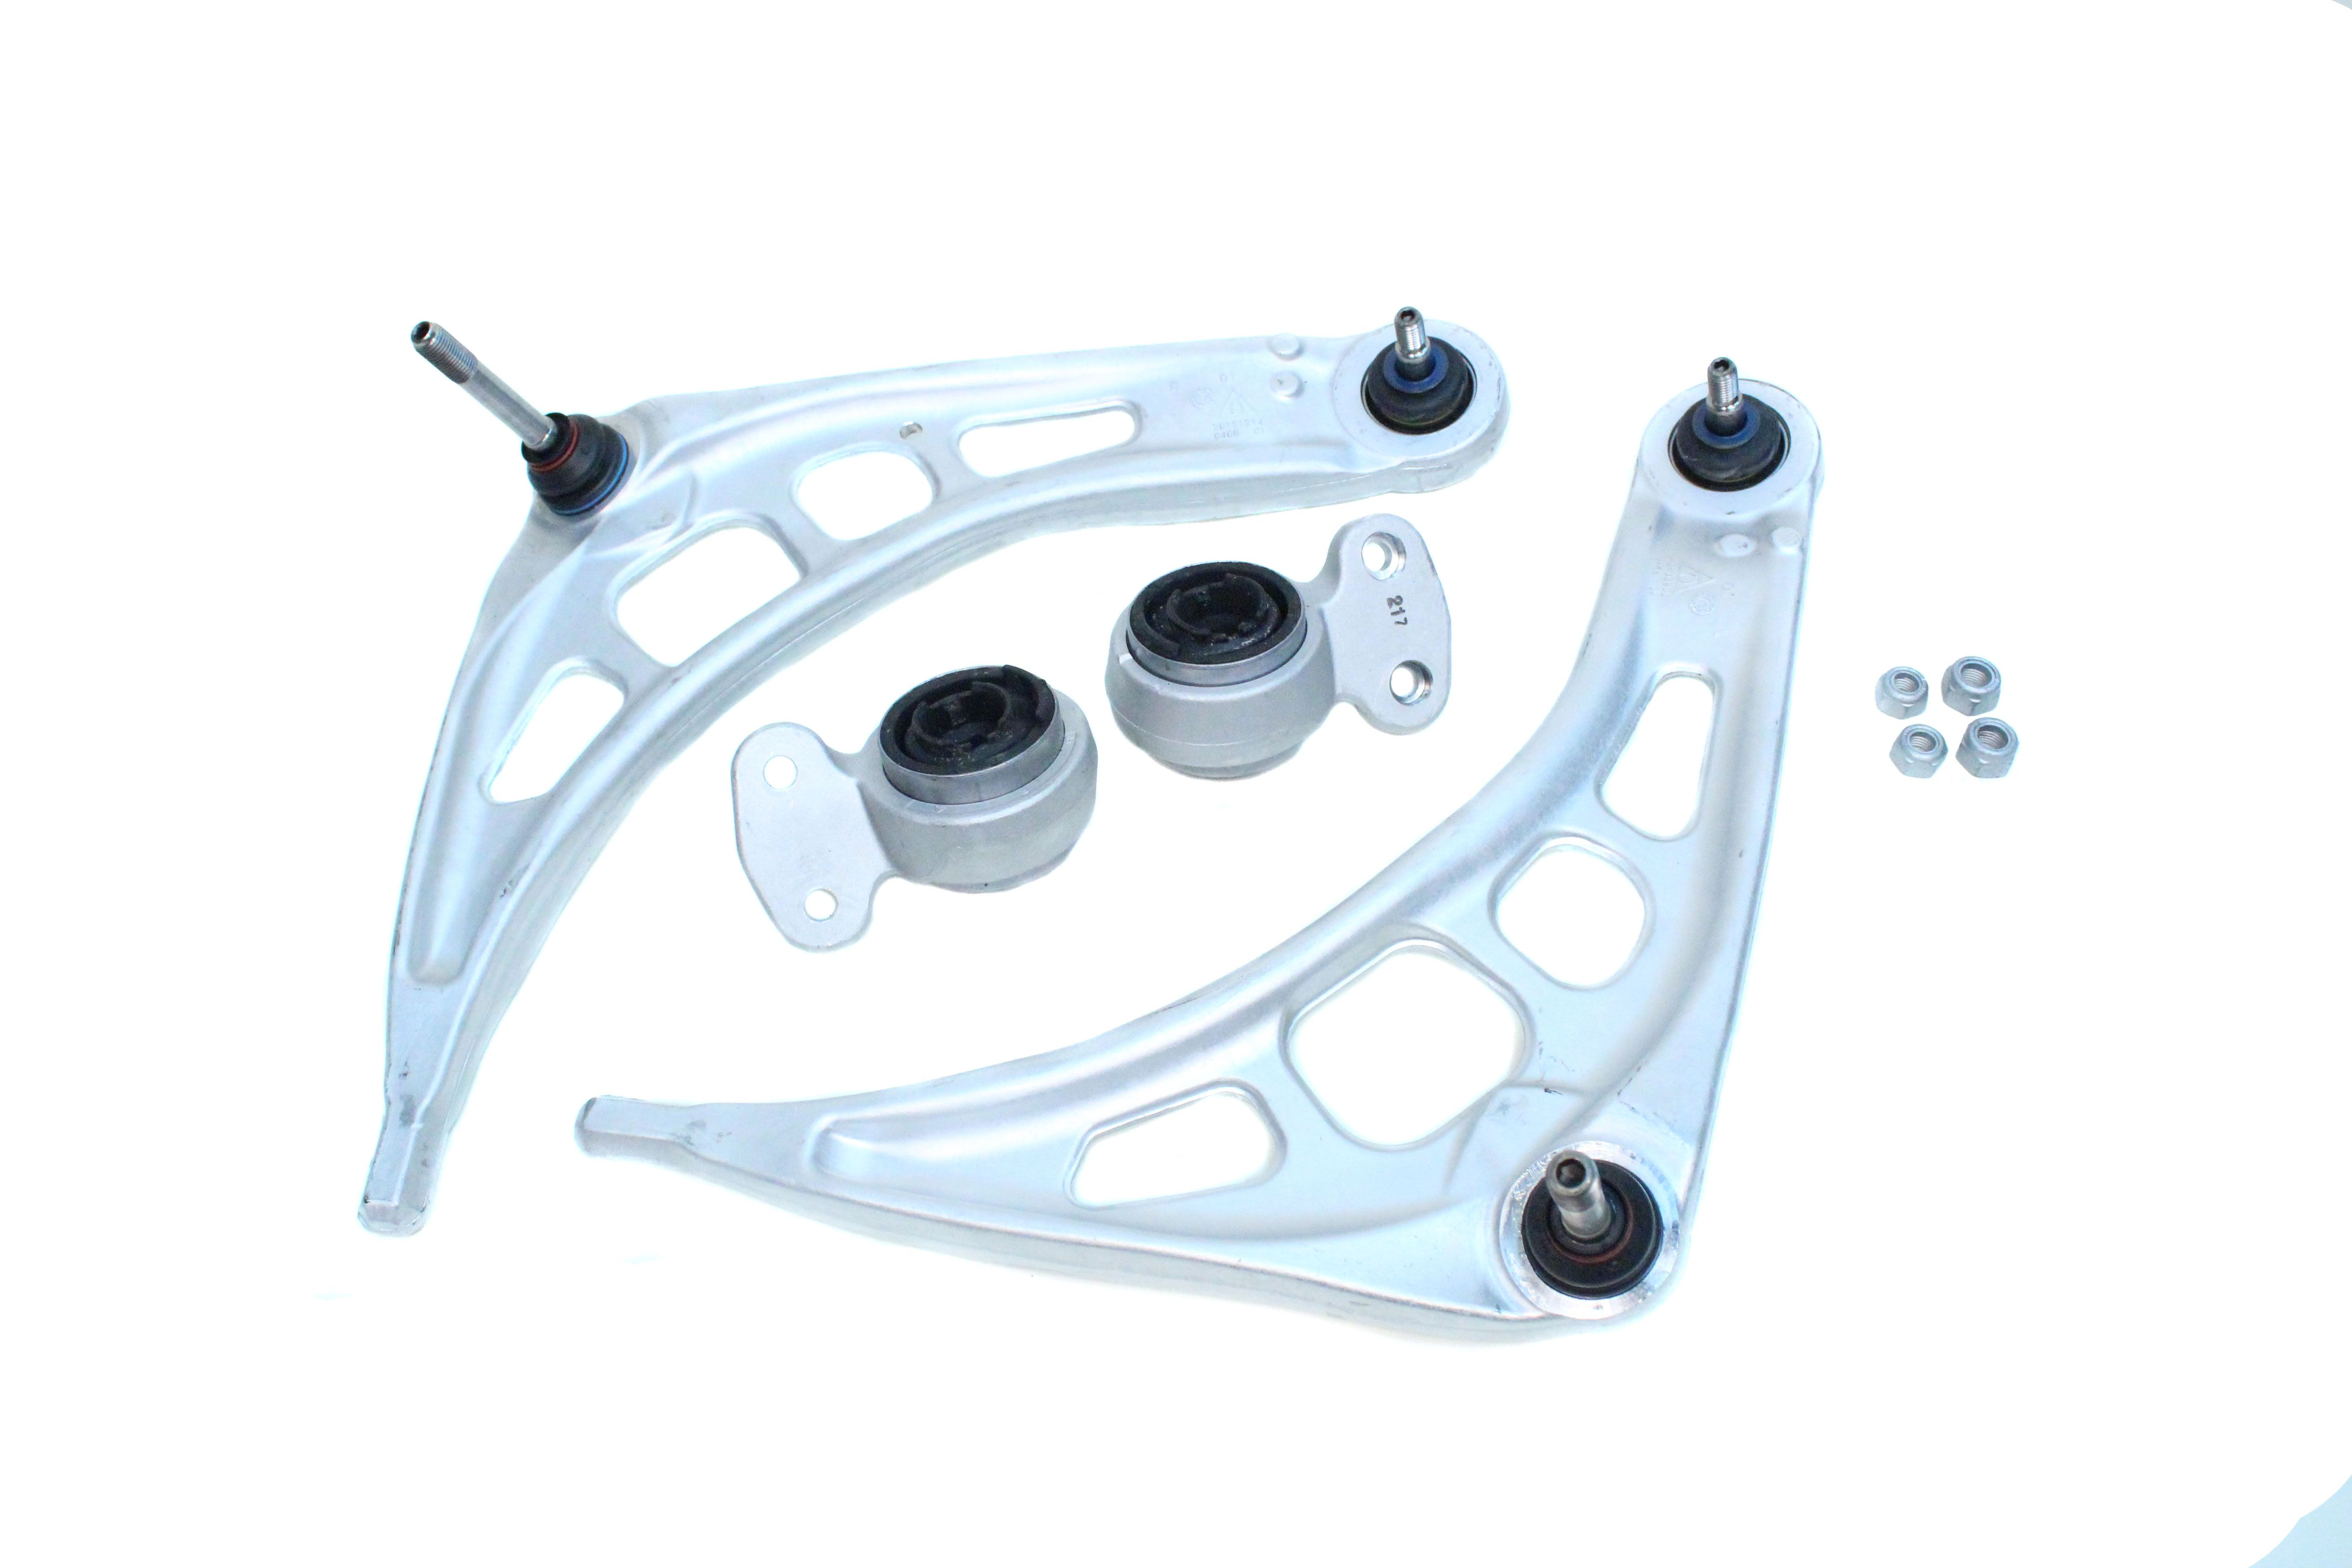 realoem enus mounting diag com oem online showparts catalog bmw hood engine parts